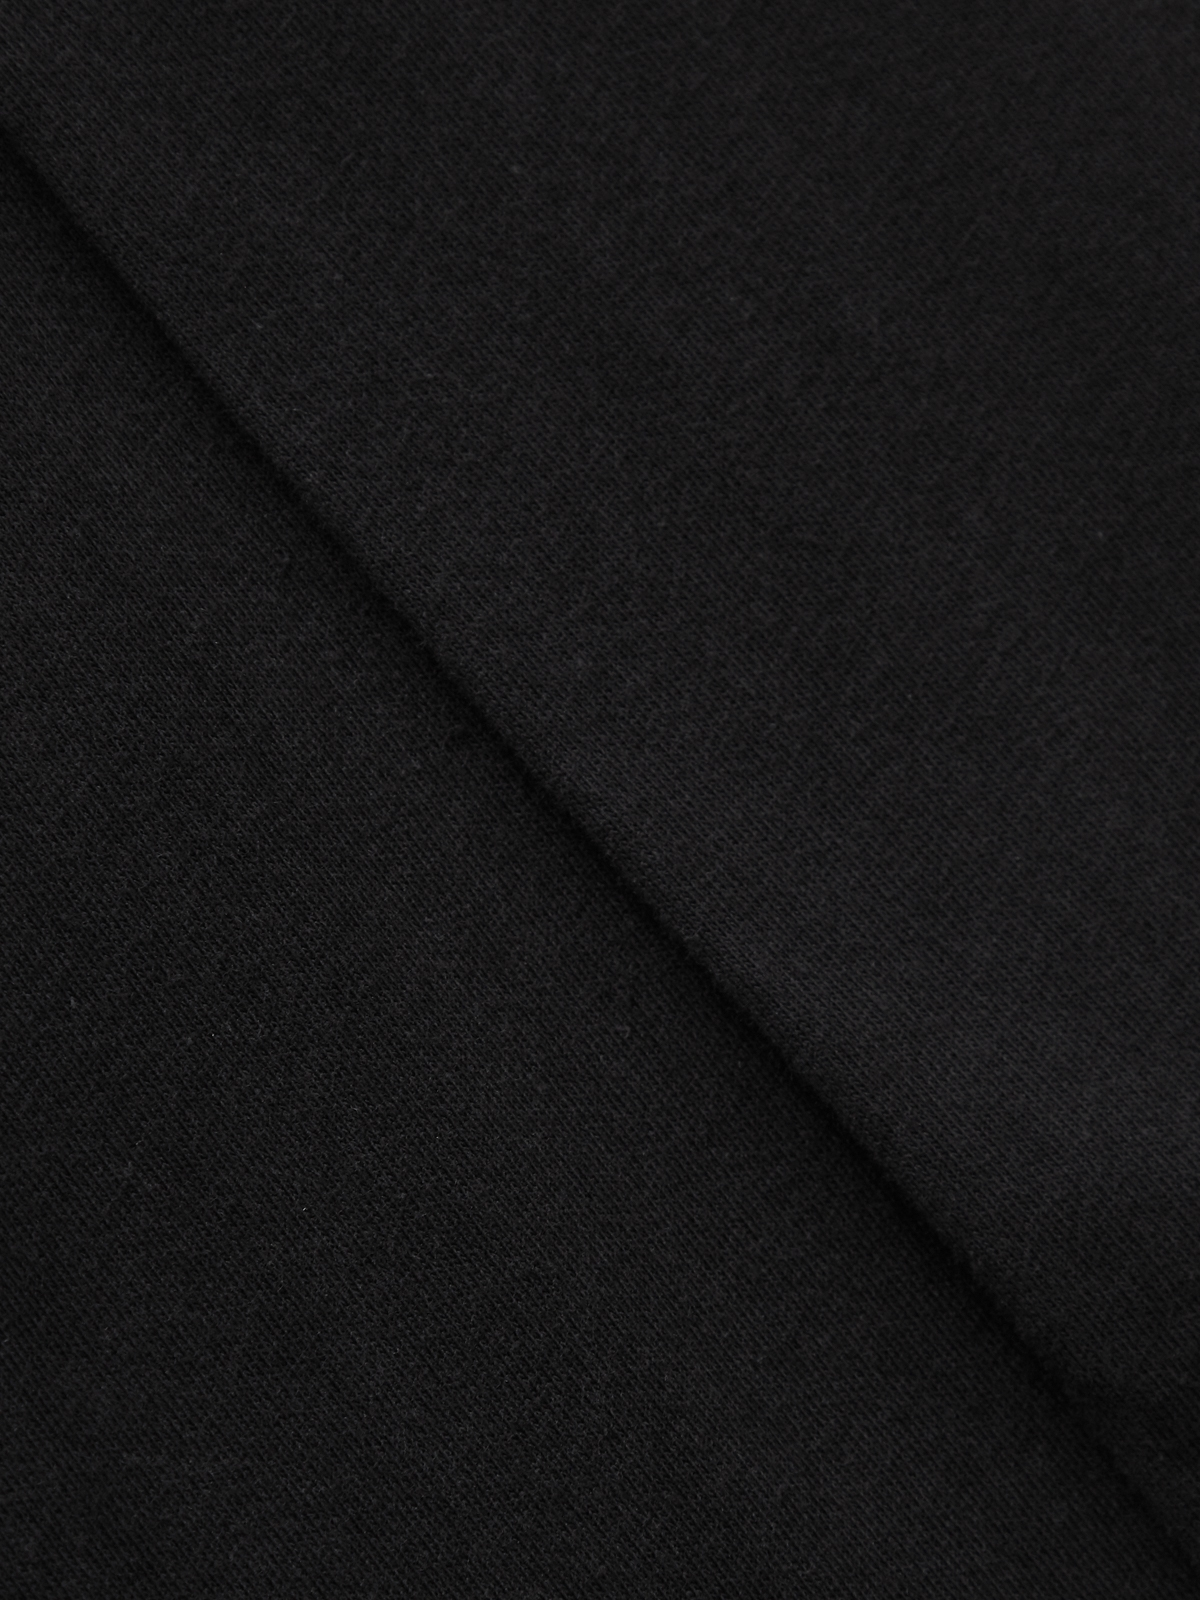 Neck Cut Out Asymmetrical Tee Black